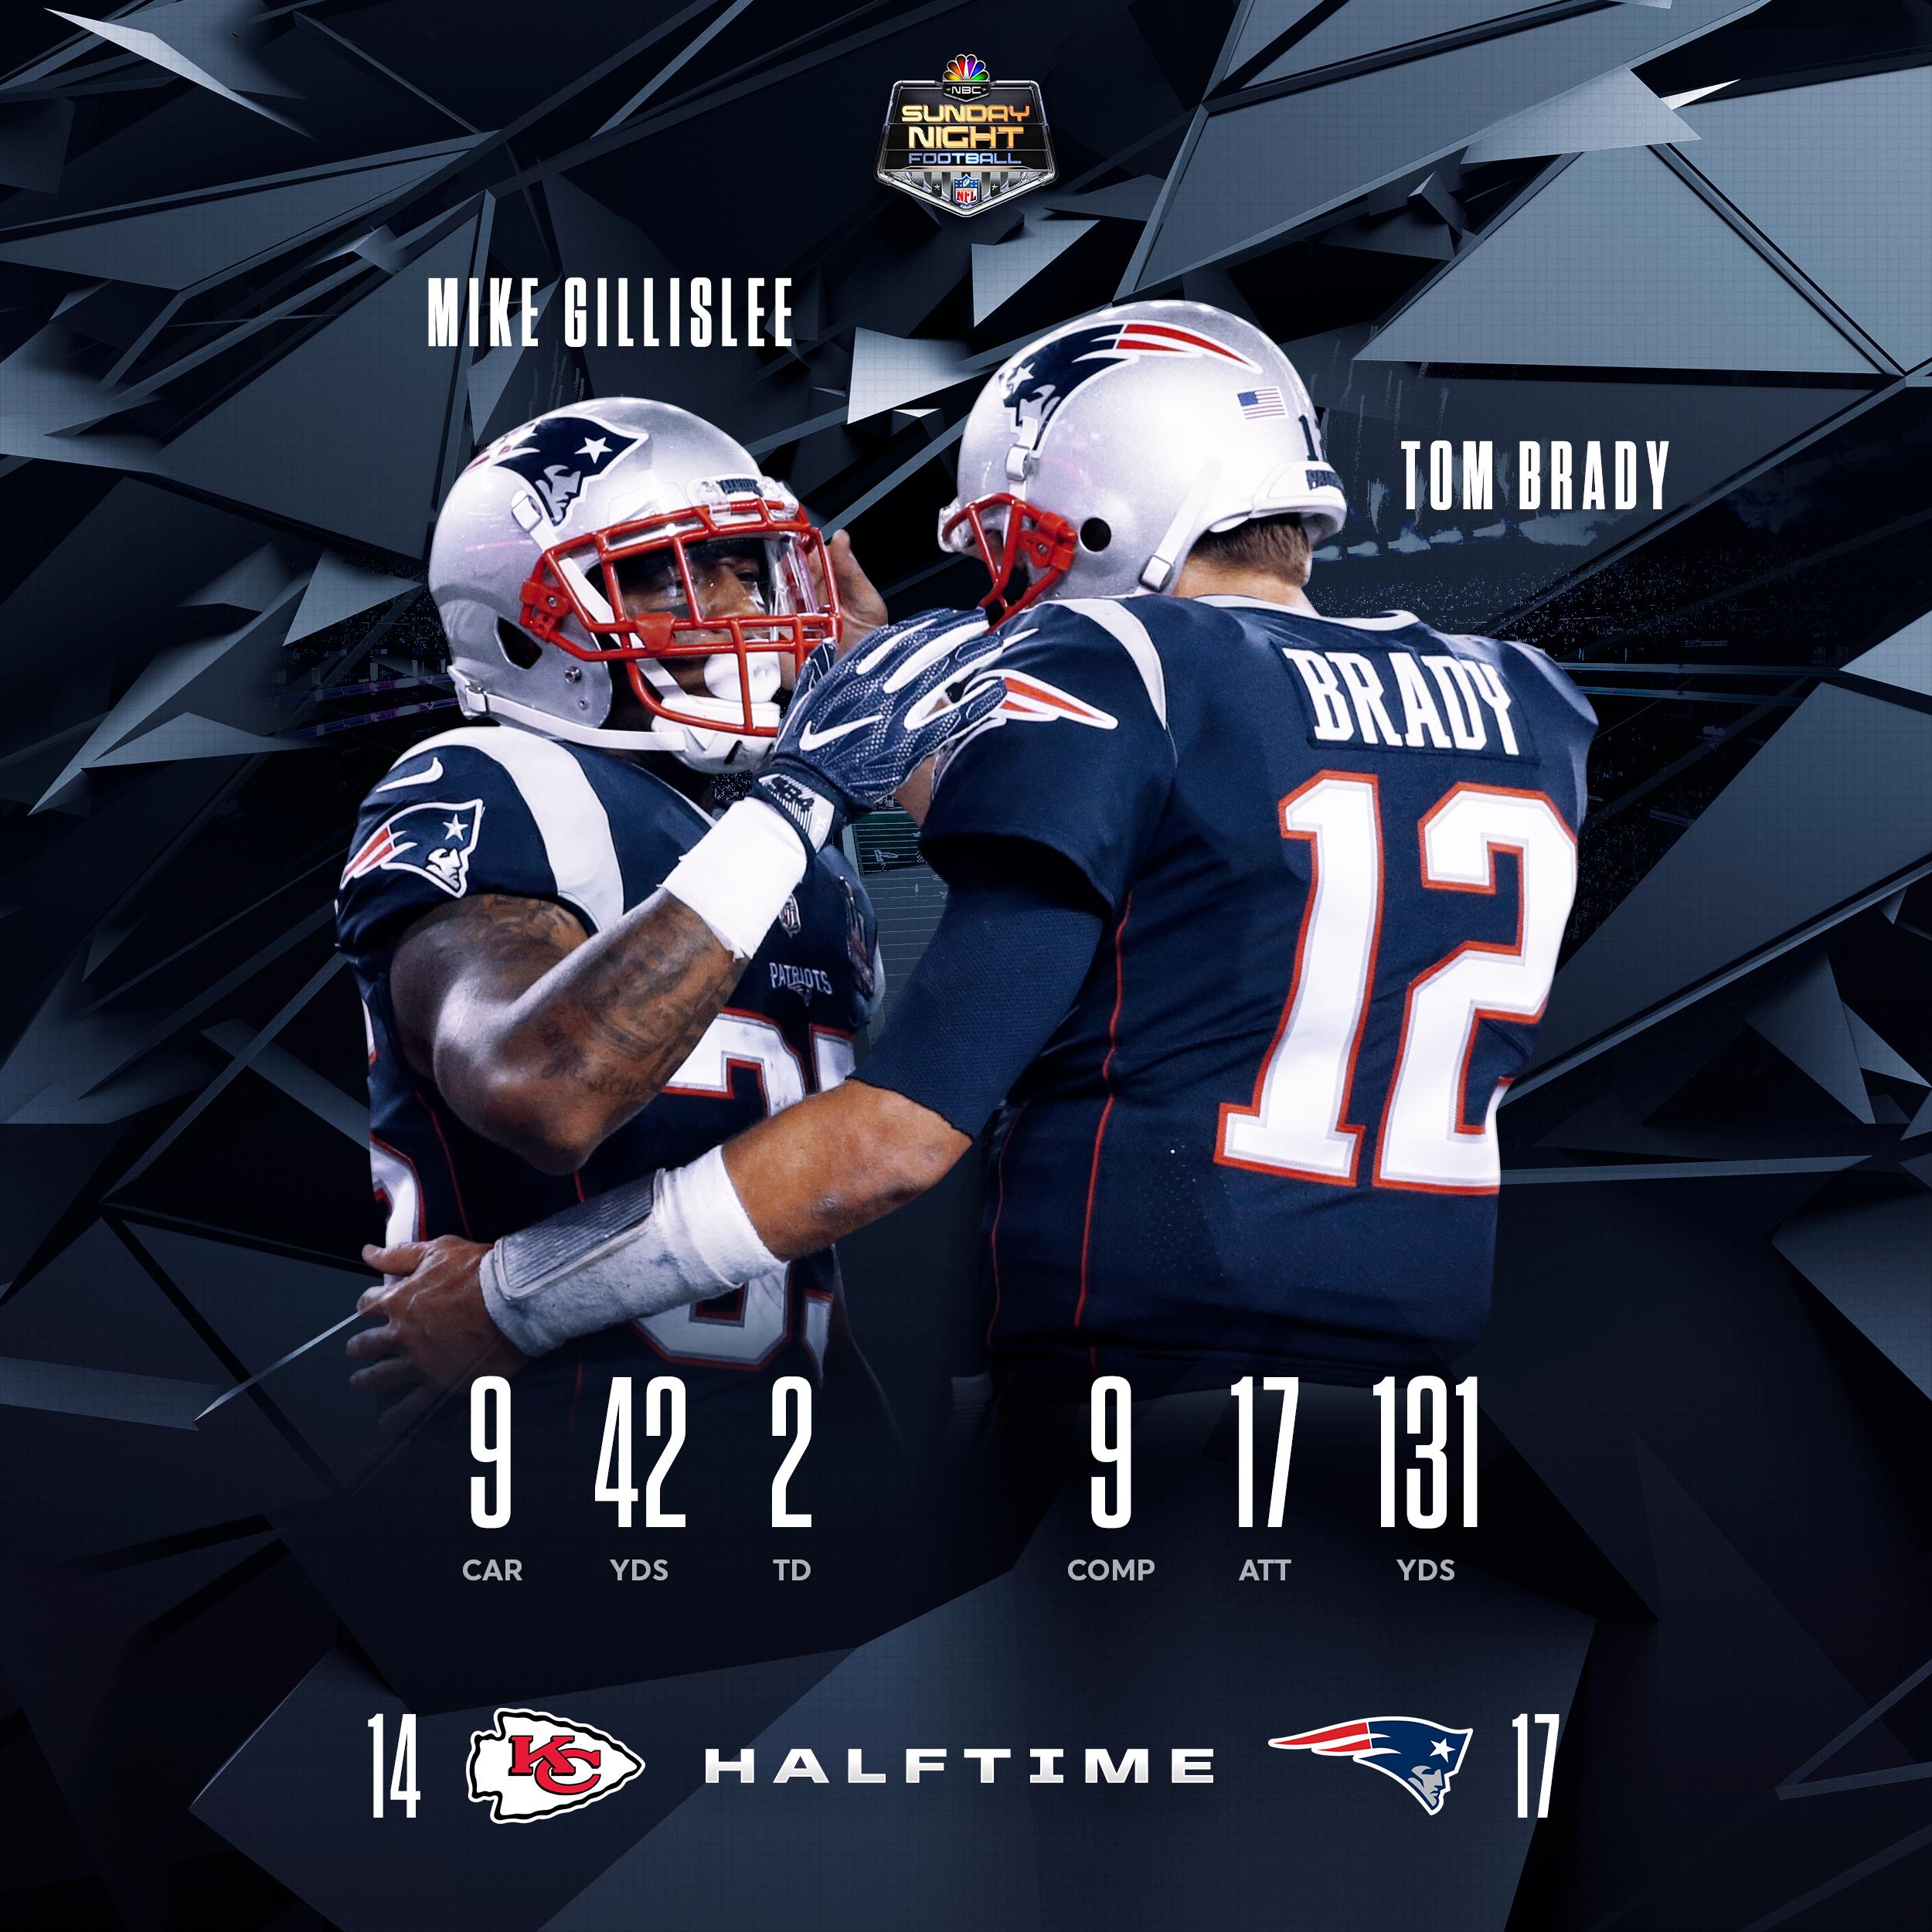 NBC_Sports_NFL_Games_Template.JPG